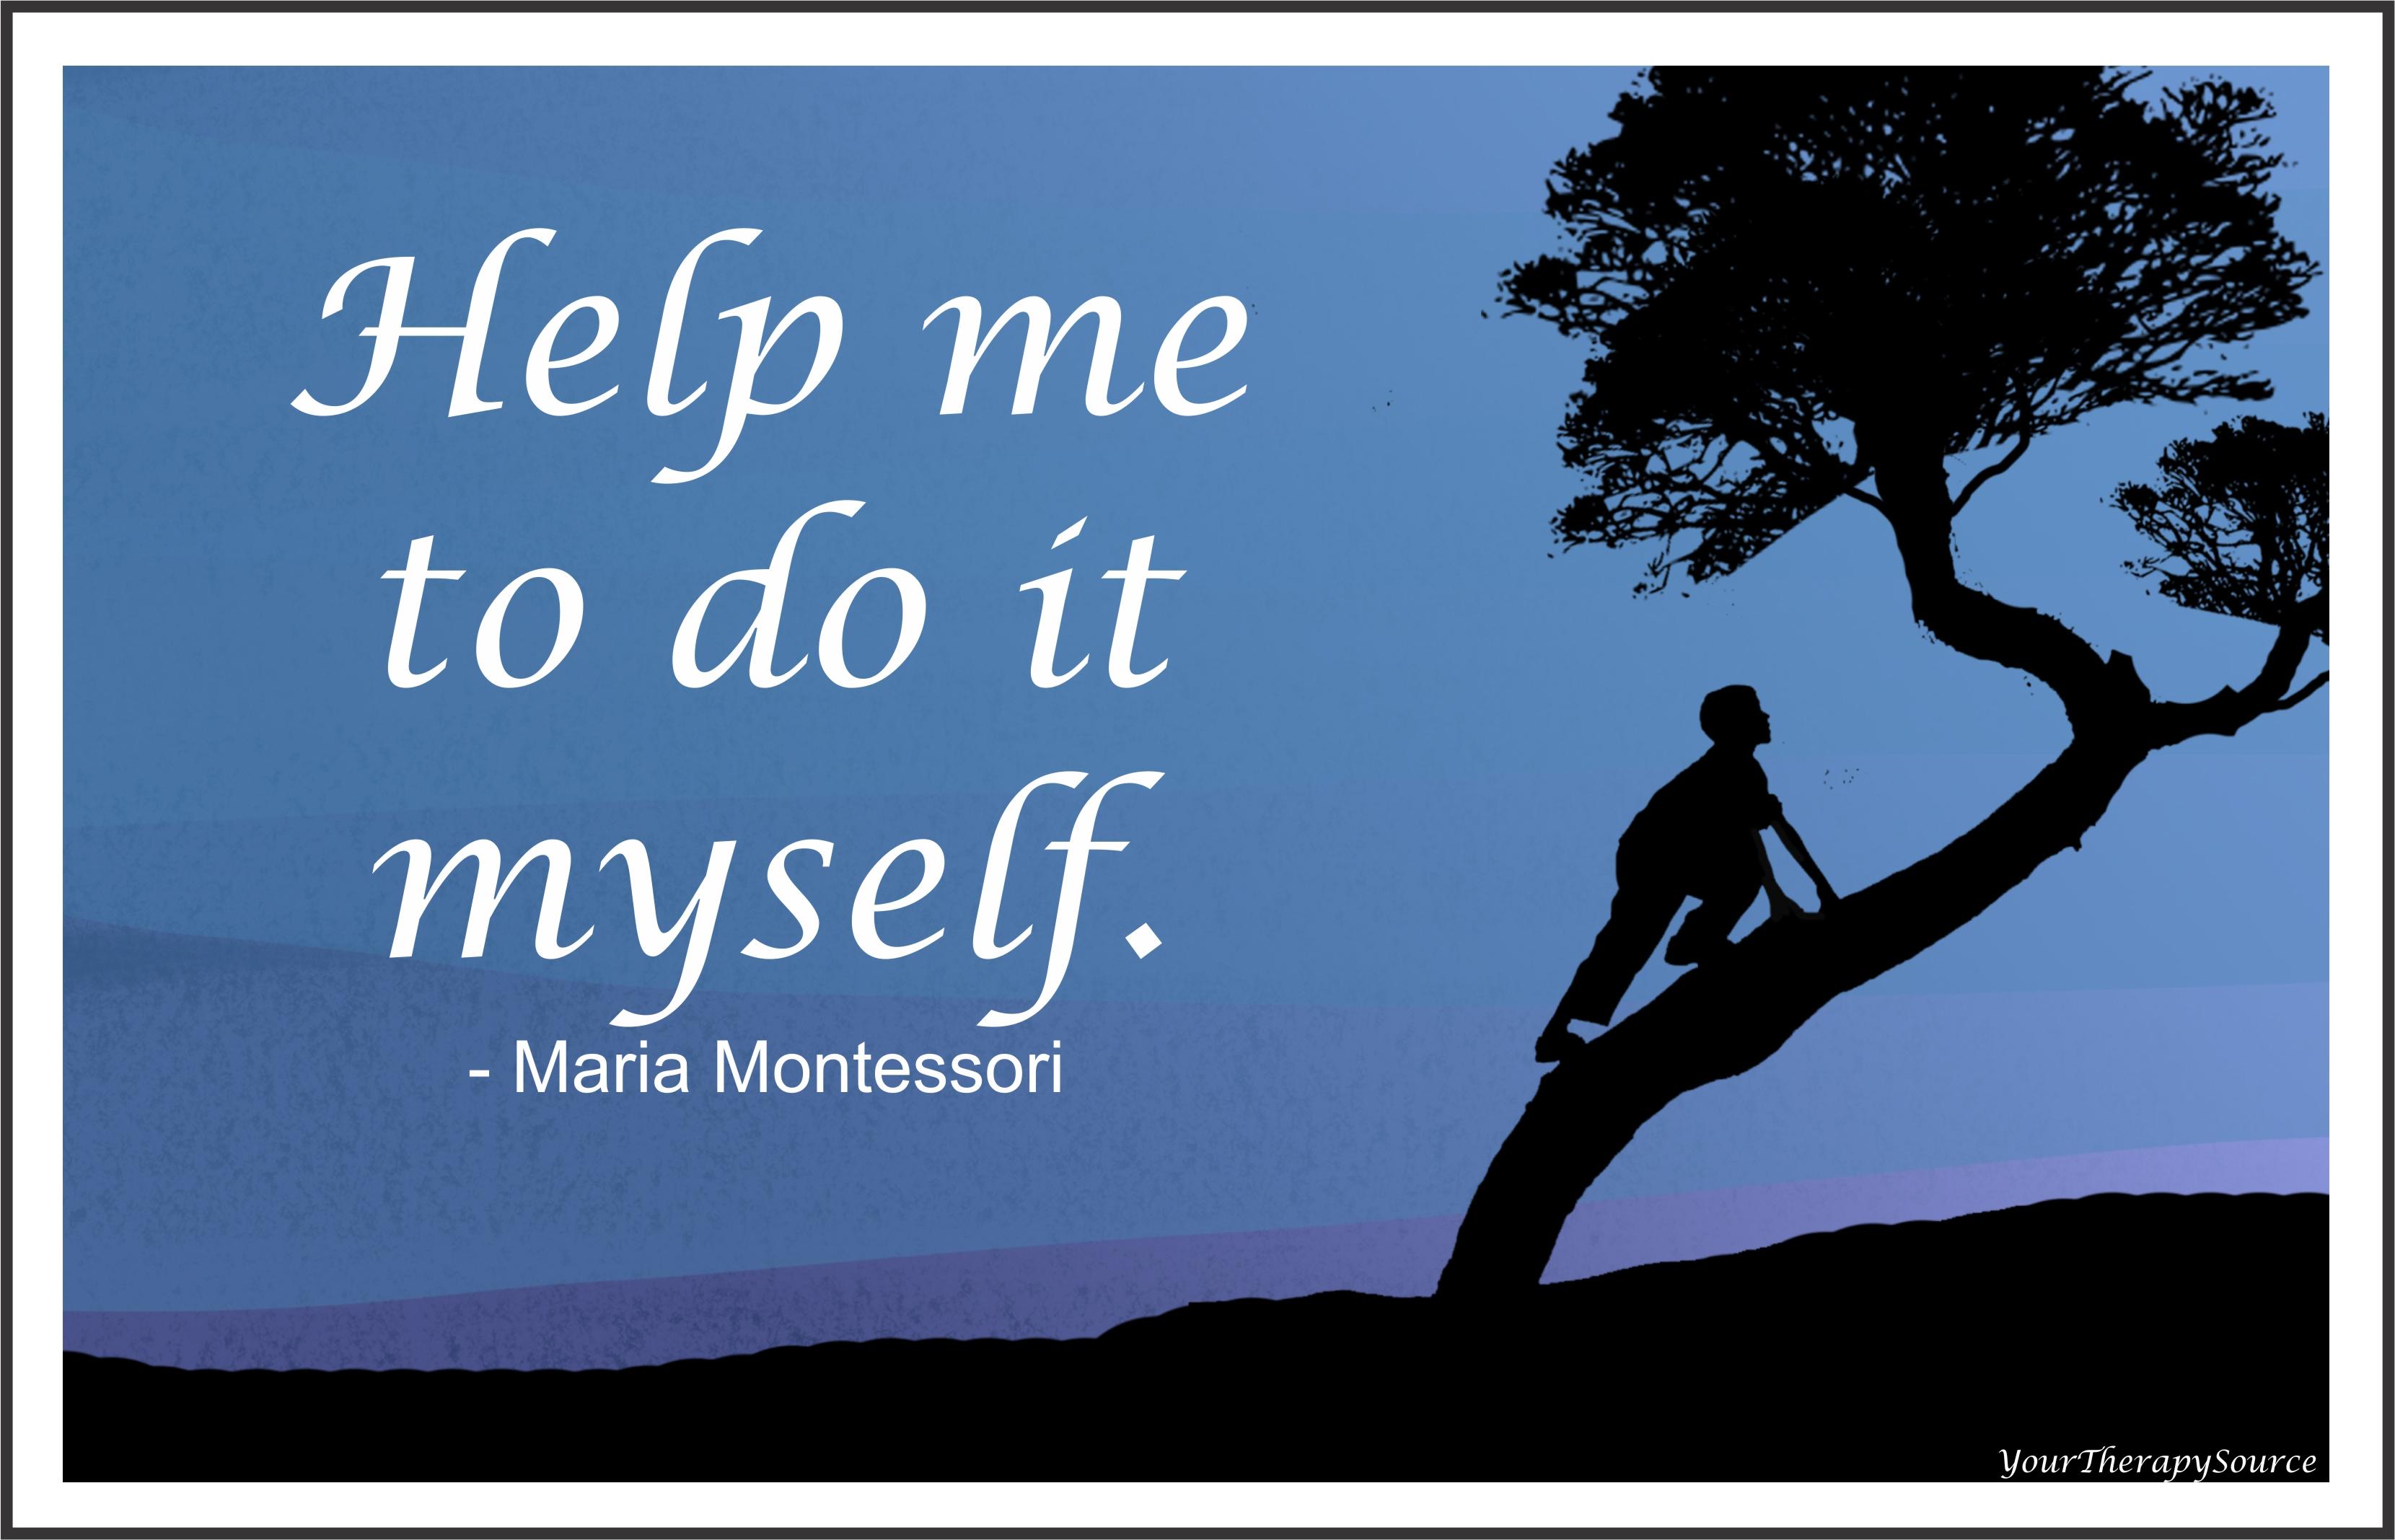 help me to do it myself - https://yourtherapysource.com/lifeskills.html